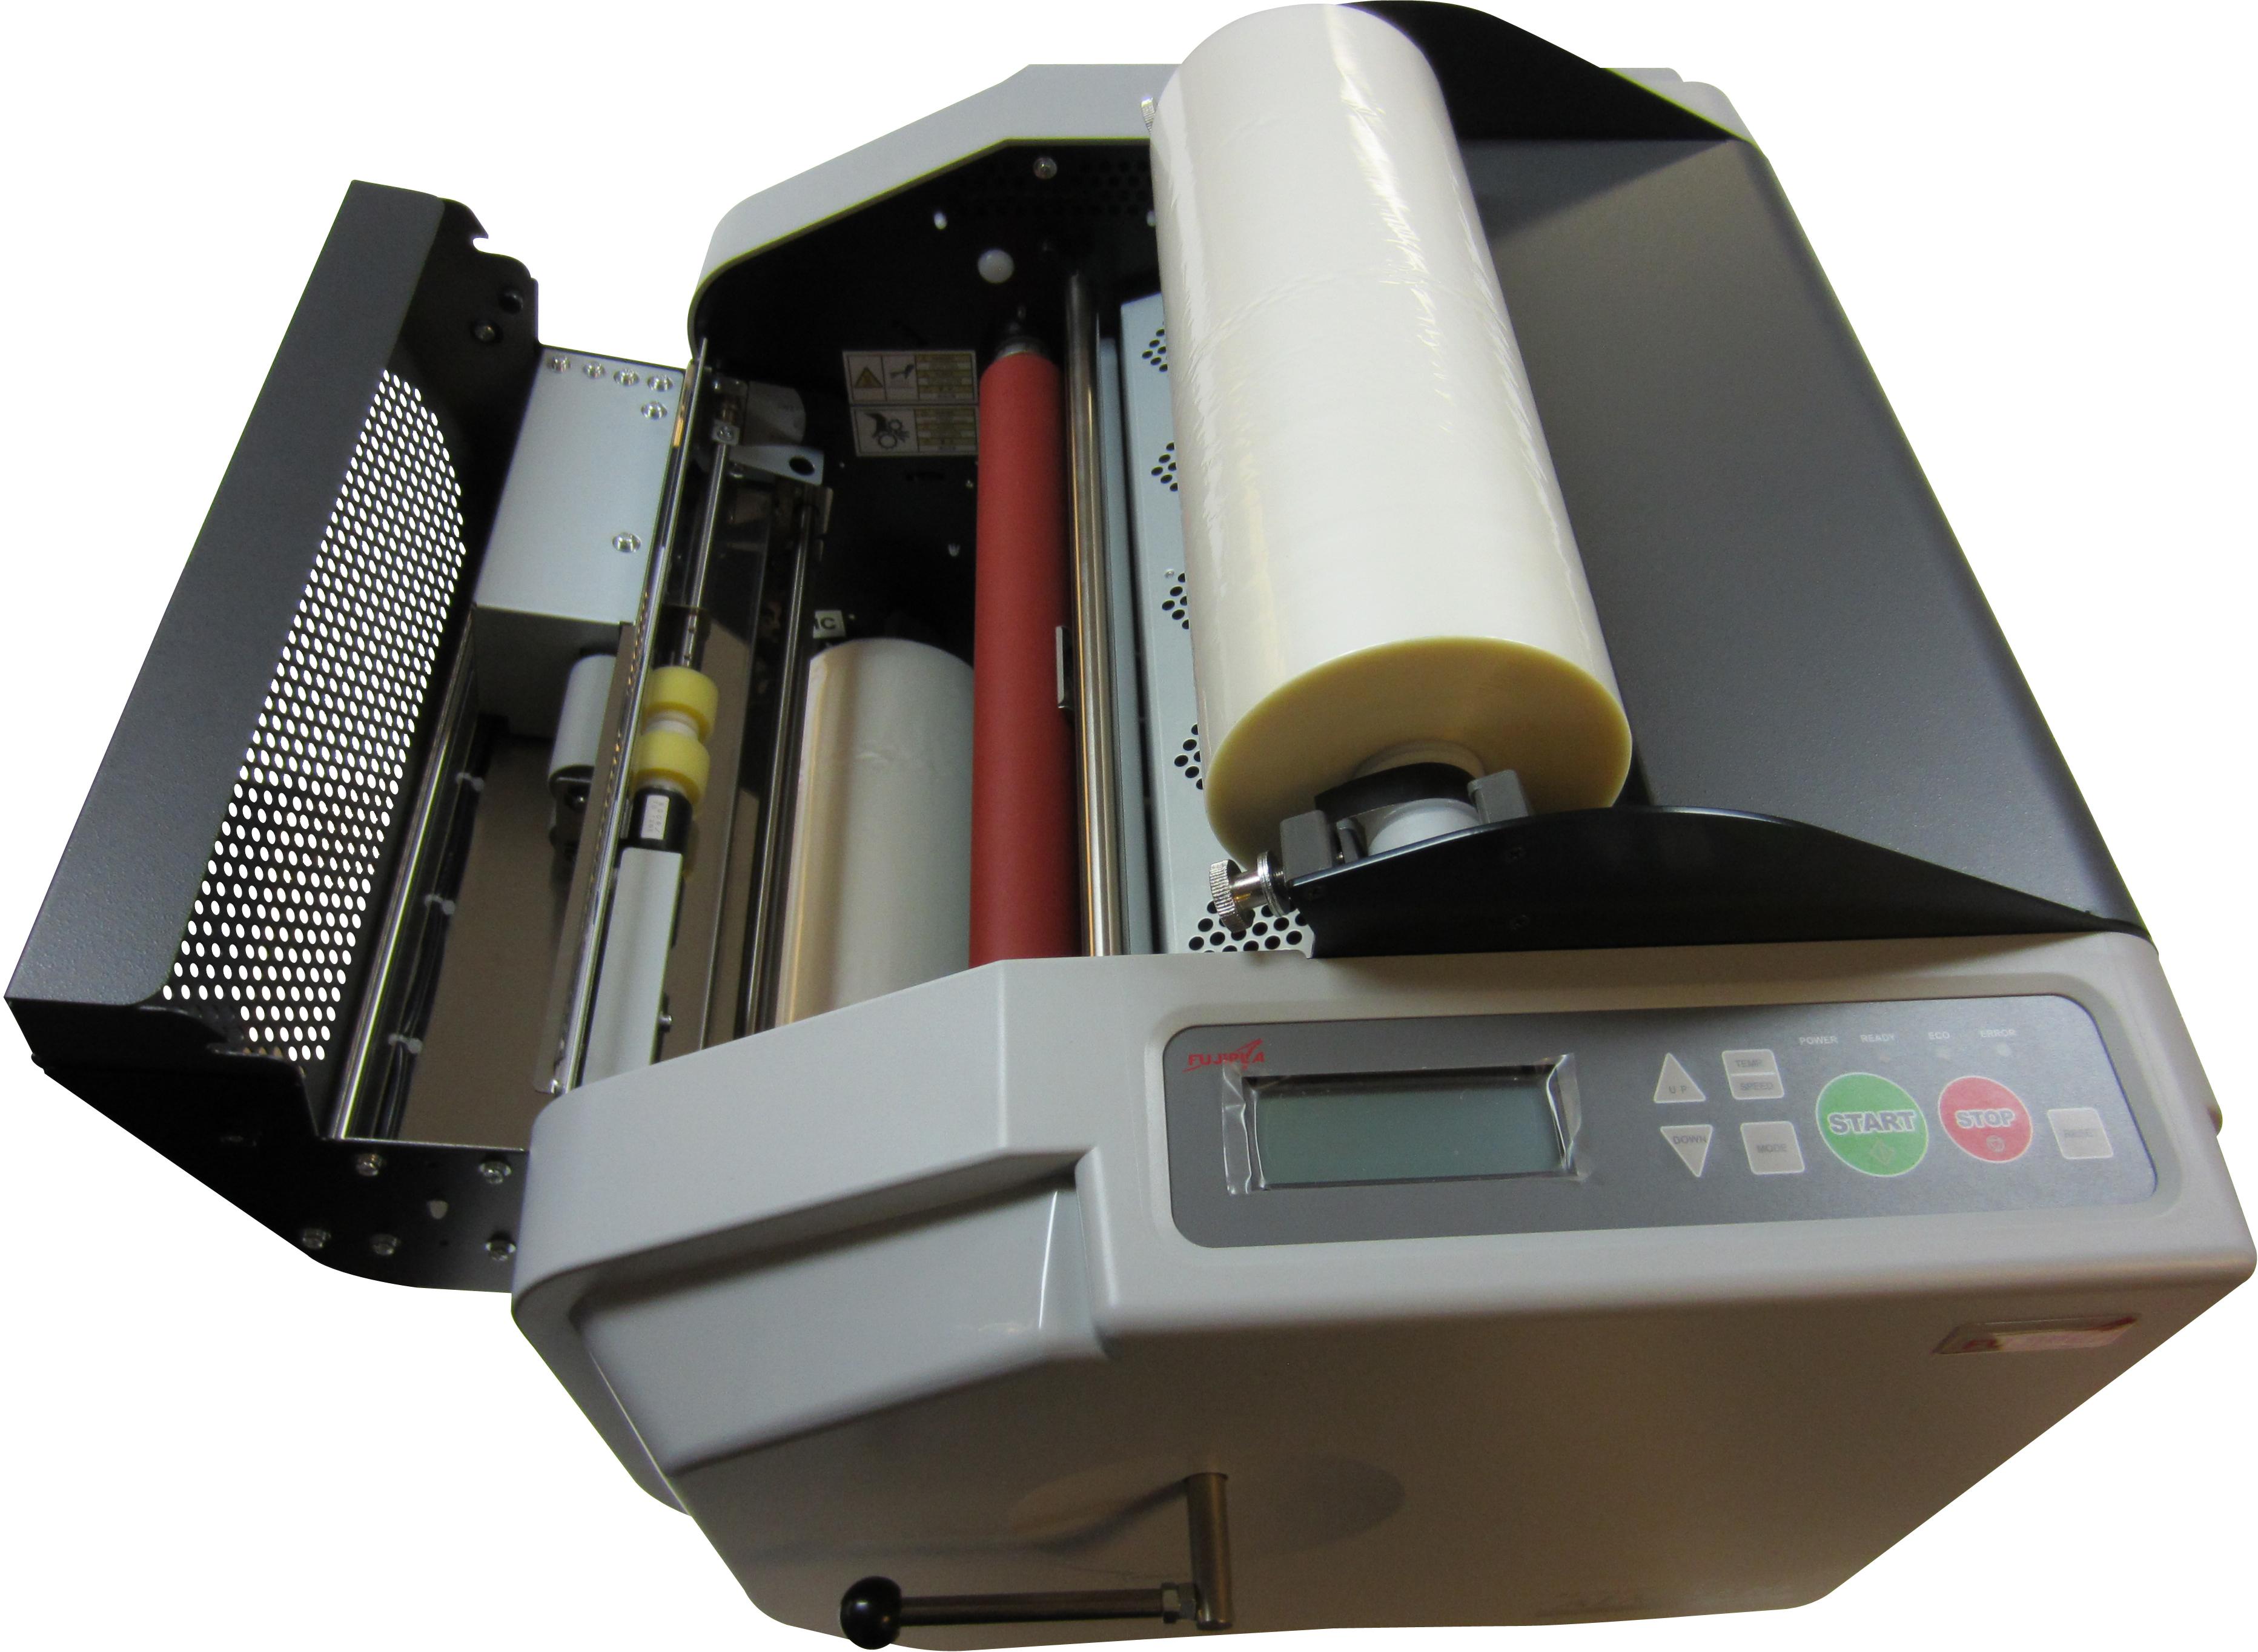 Index of /images/print-finishing-equipment/laminating-machines /automatic/fujipla-alm3230/